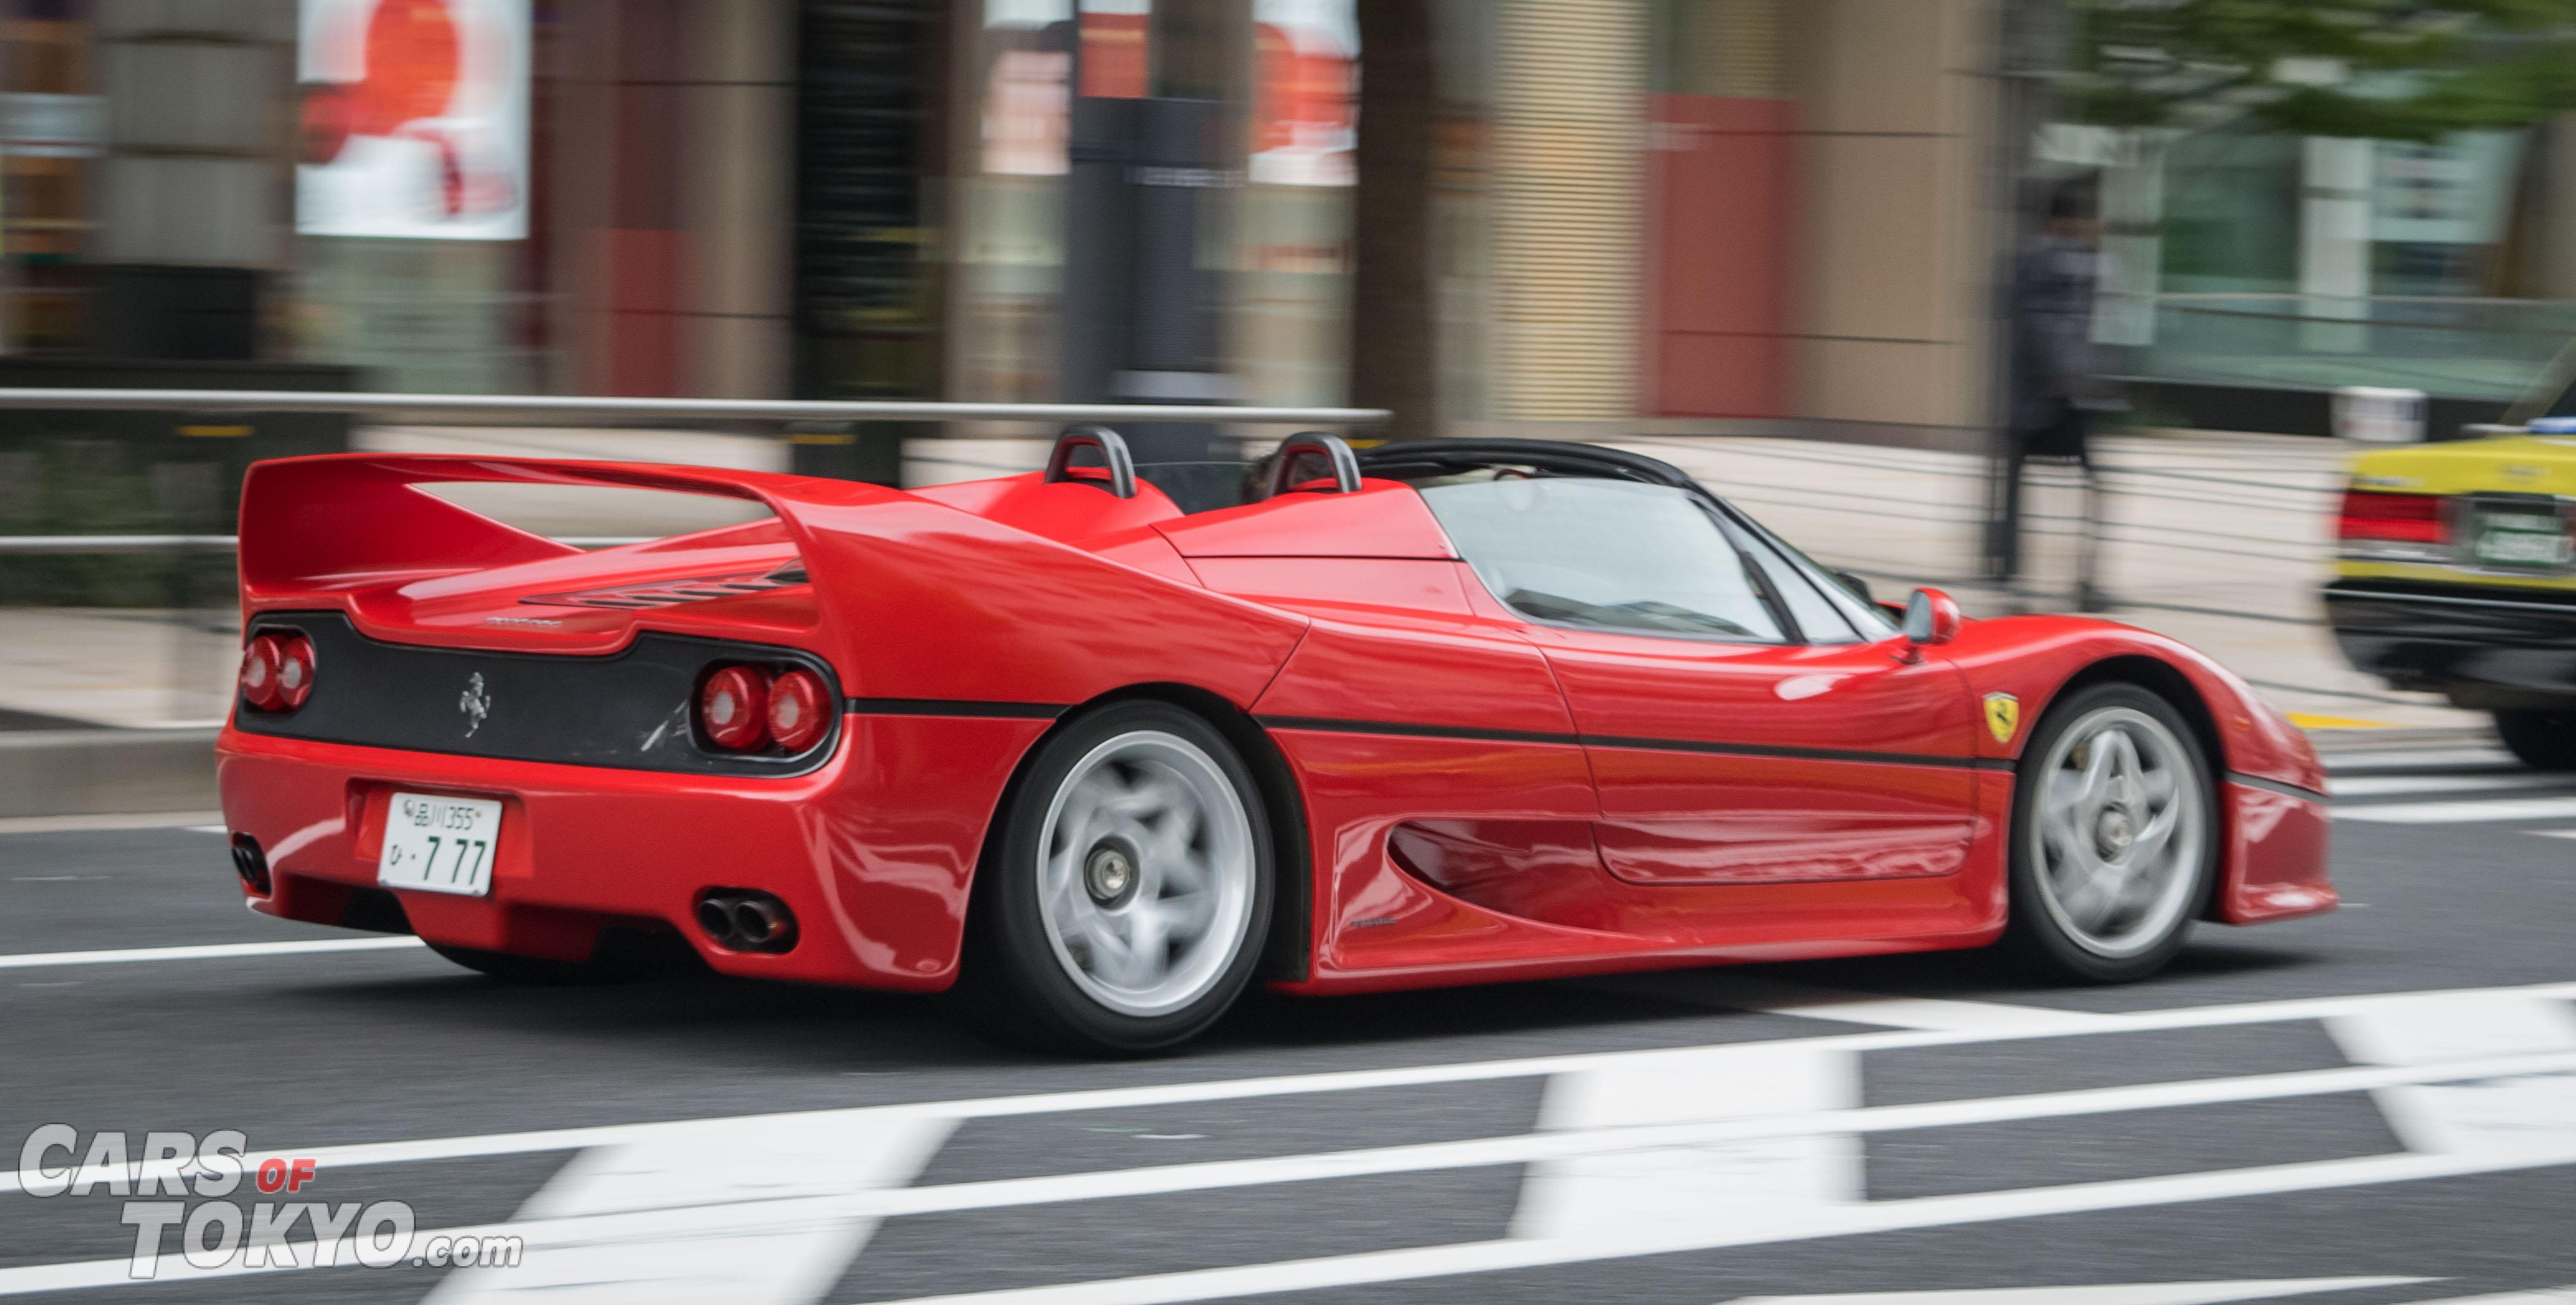 Cars of Tokyo Classic Ferrari F50